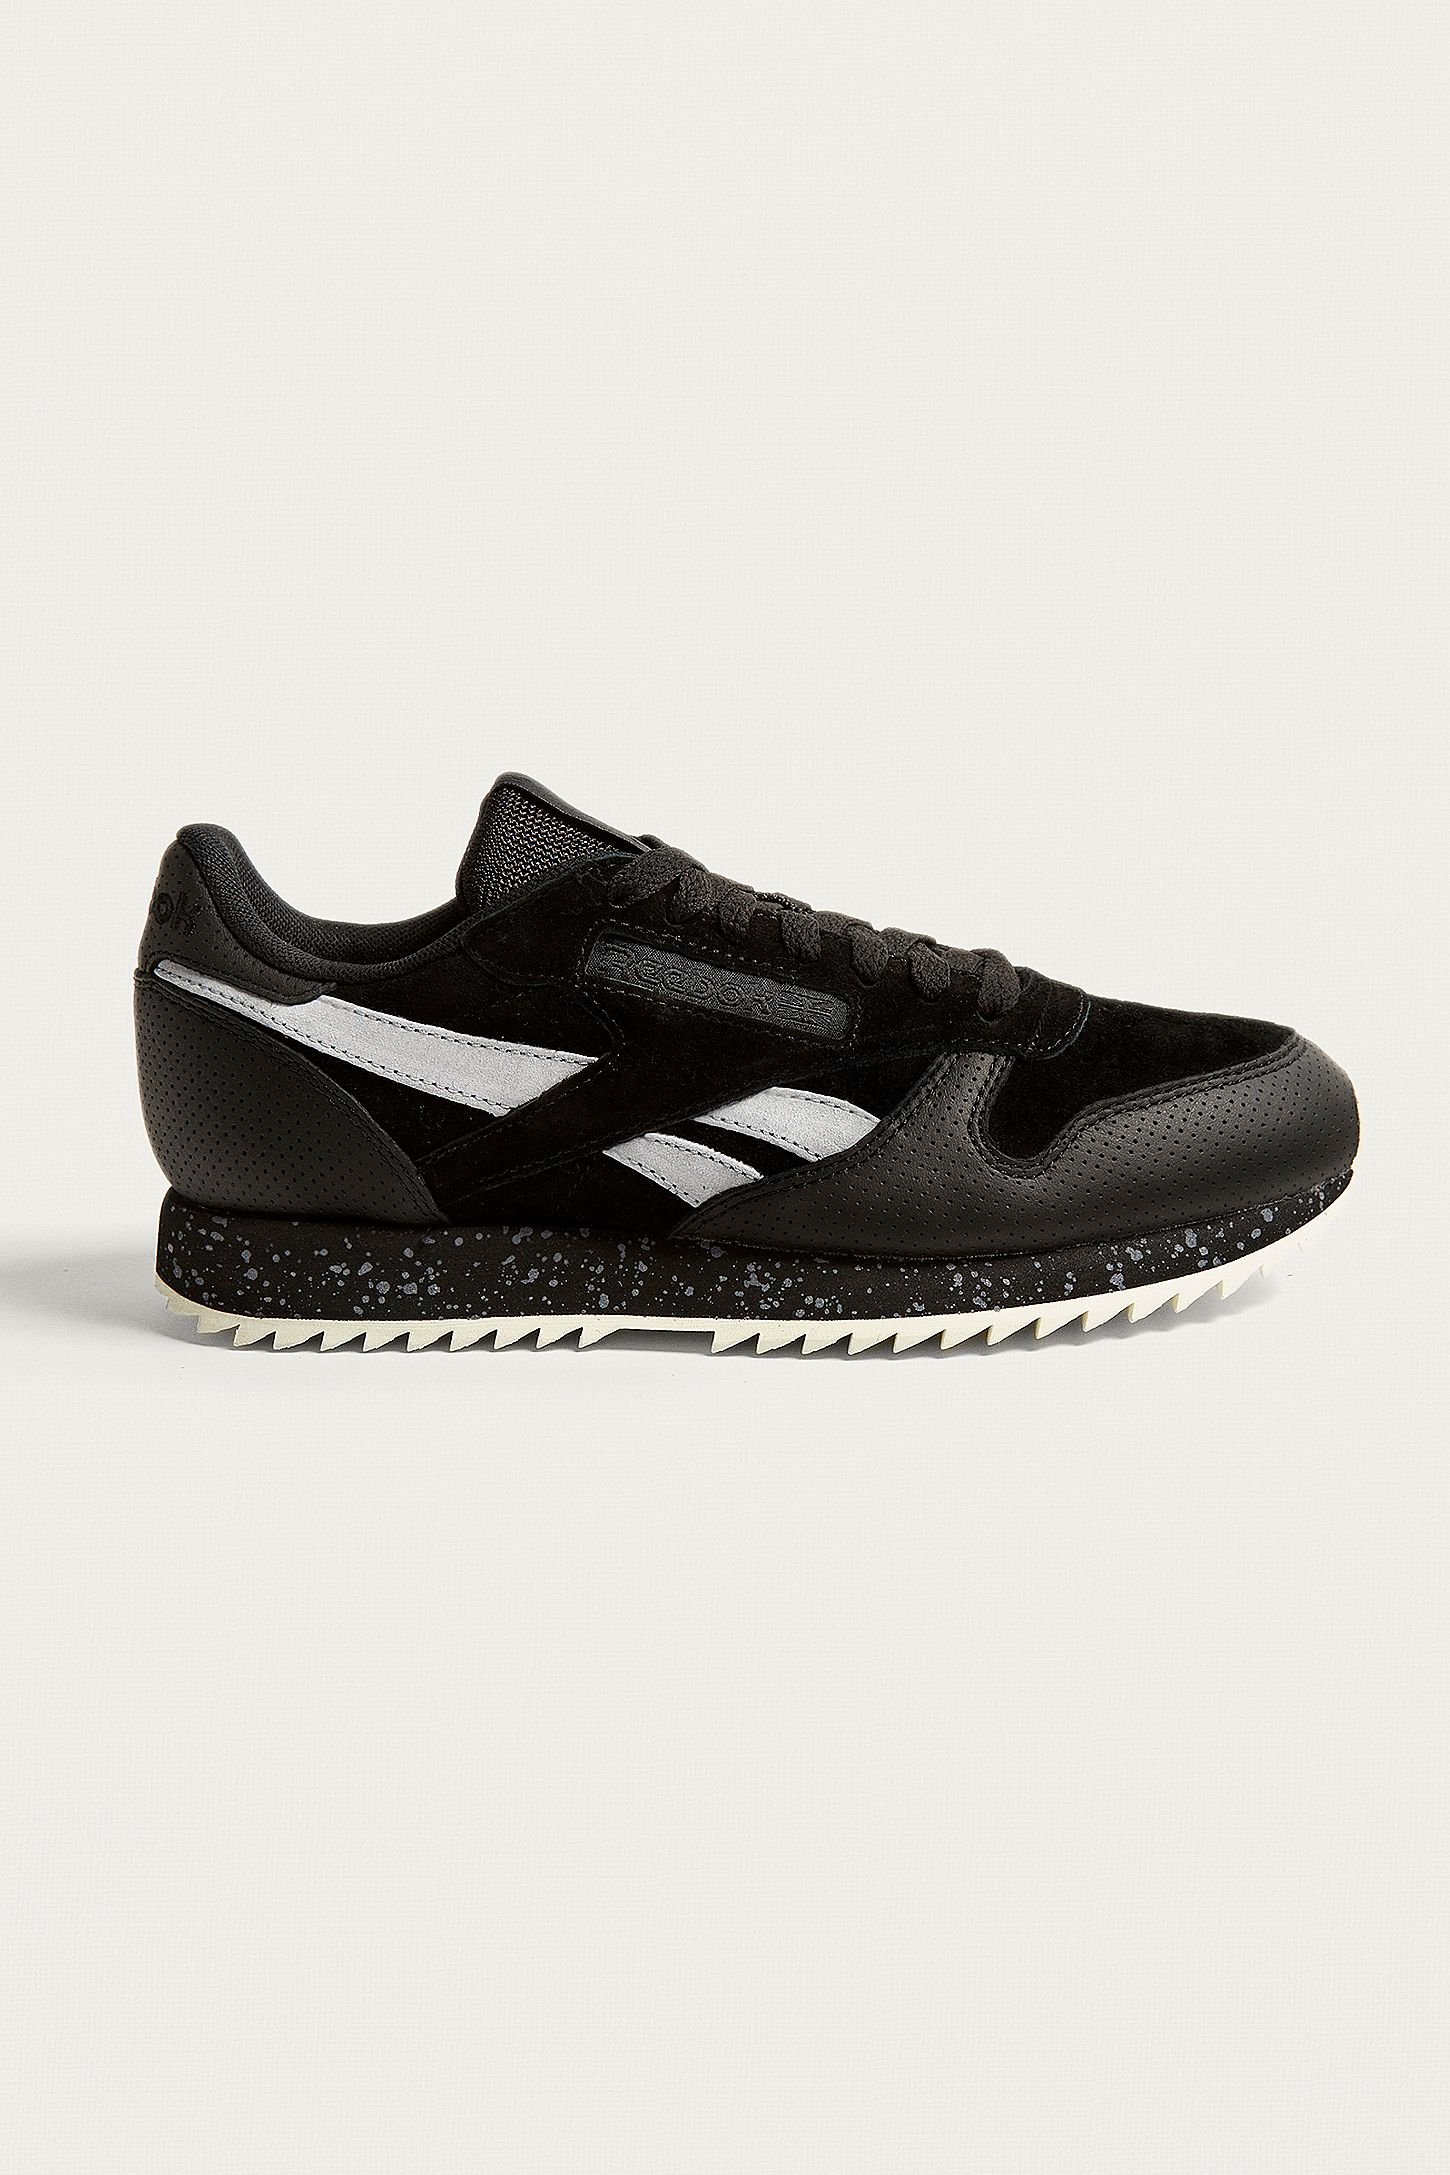 2ad8f1b725ad4 Reebok Classic Black Leather Ripple Trainers